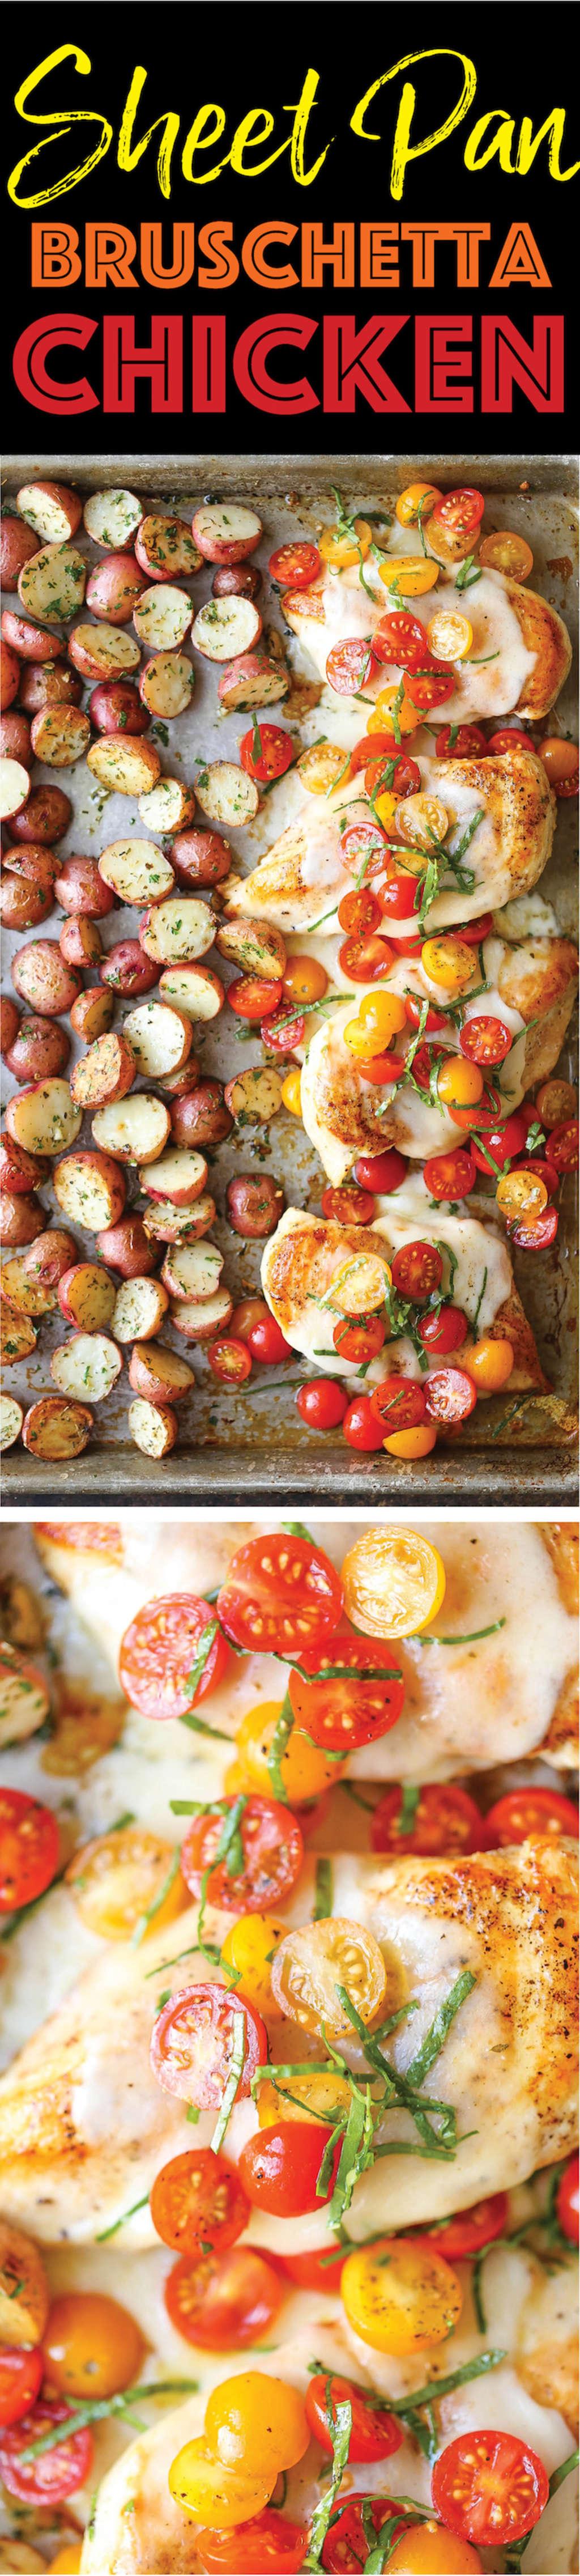 Sheet Pan Bruschetta Chicken from Damn Delicious